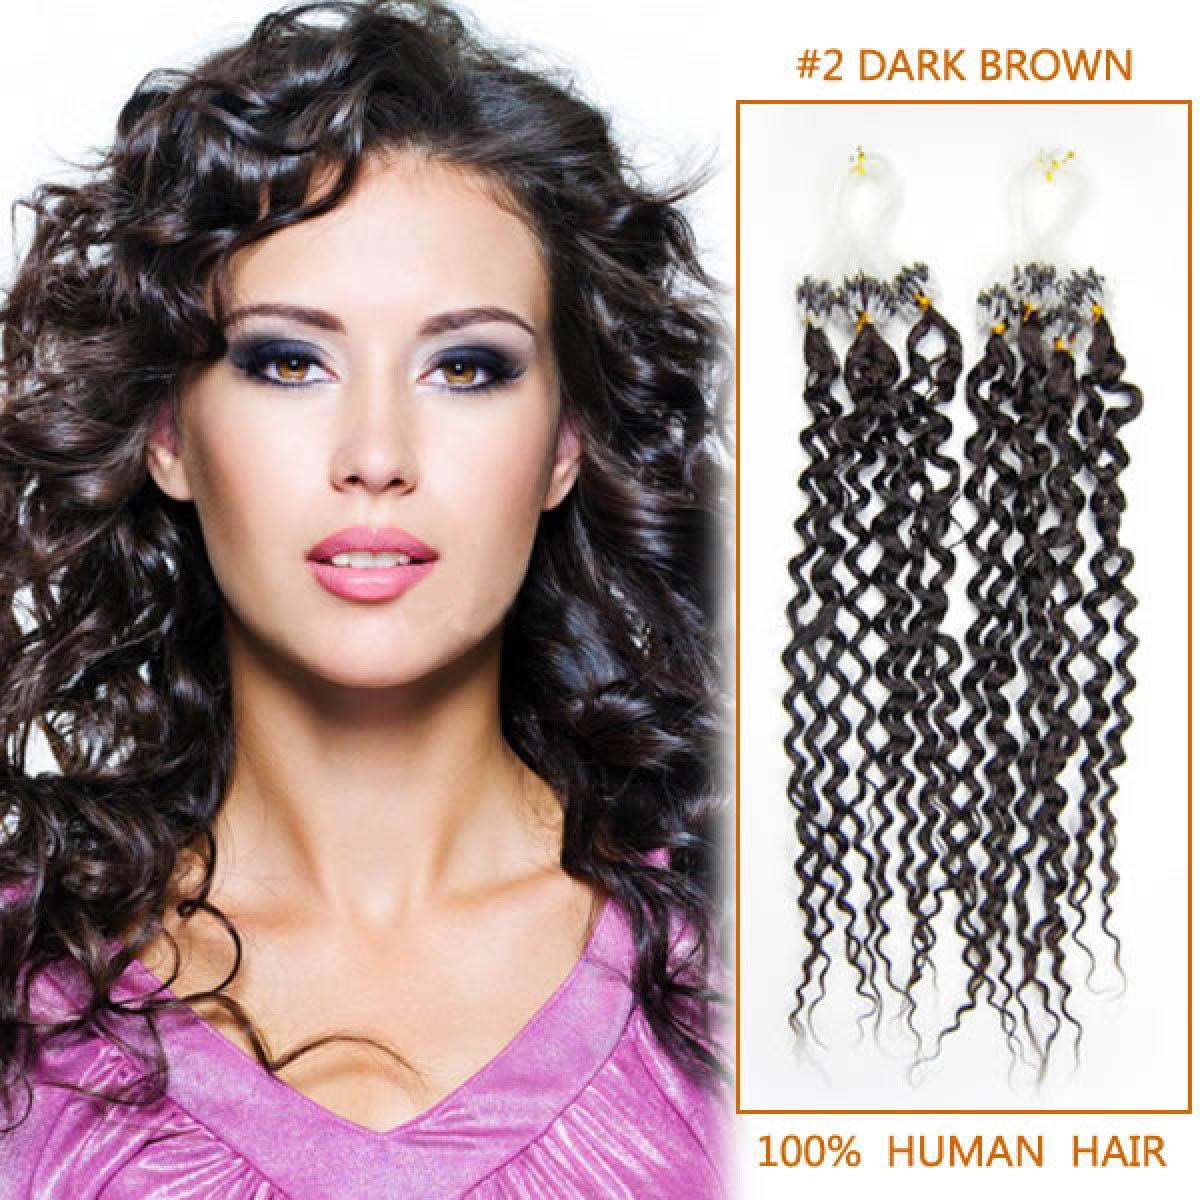 Inch 2 dark brown dense spiral curly micro loop hair extensions 20 inch 2 dark brown dense spiral curly micro loop hair extensions 100 strands pmusecretfo Choice Image